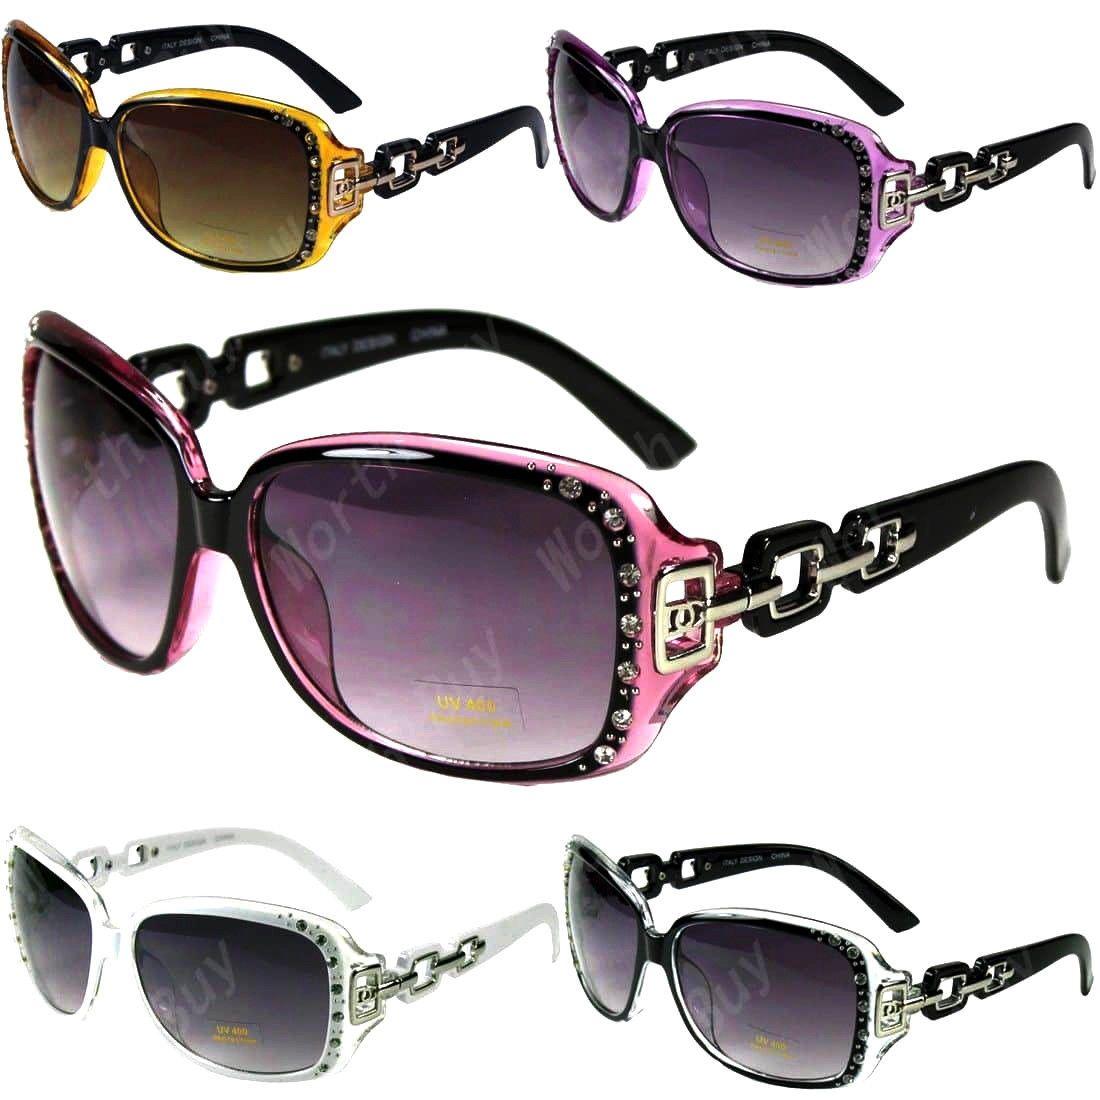 DG Sunglasses # DG23083 NWT Trendy Designer Eyewear Shades